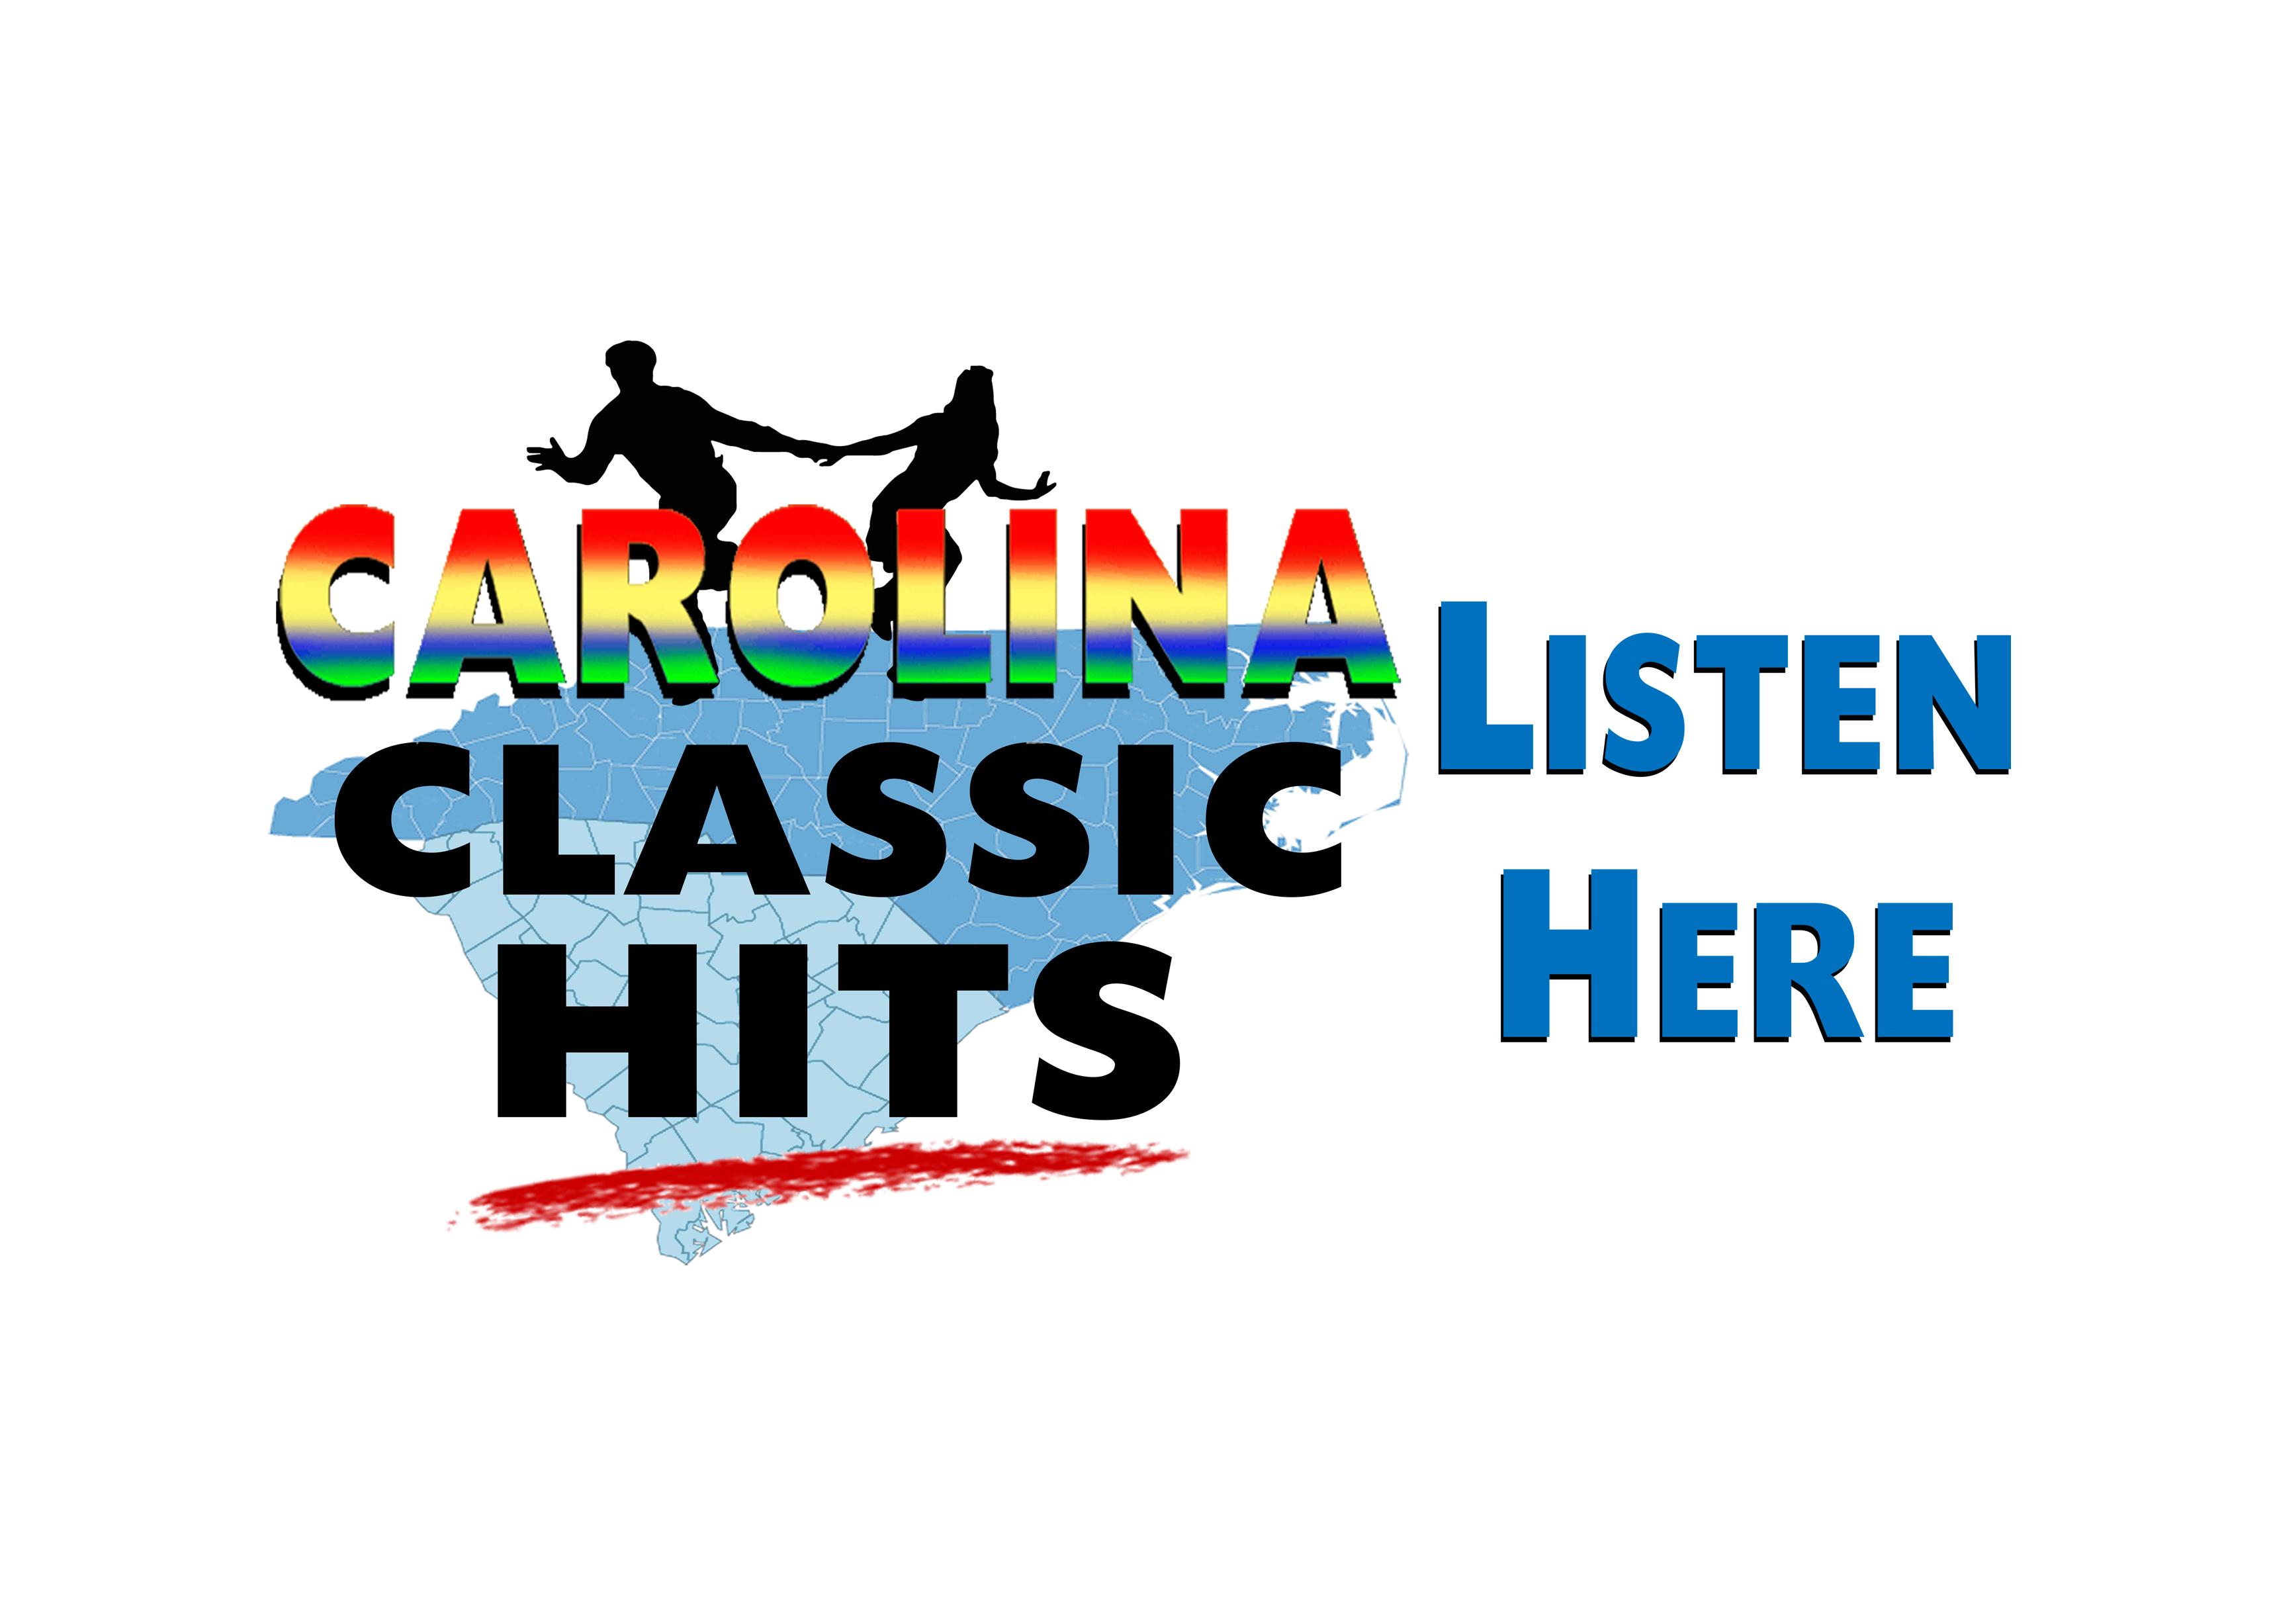 Cch carolina classic hits radio station for Classic house radio station